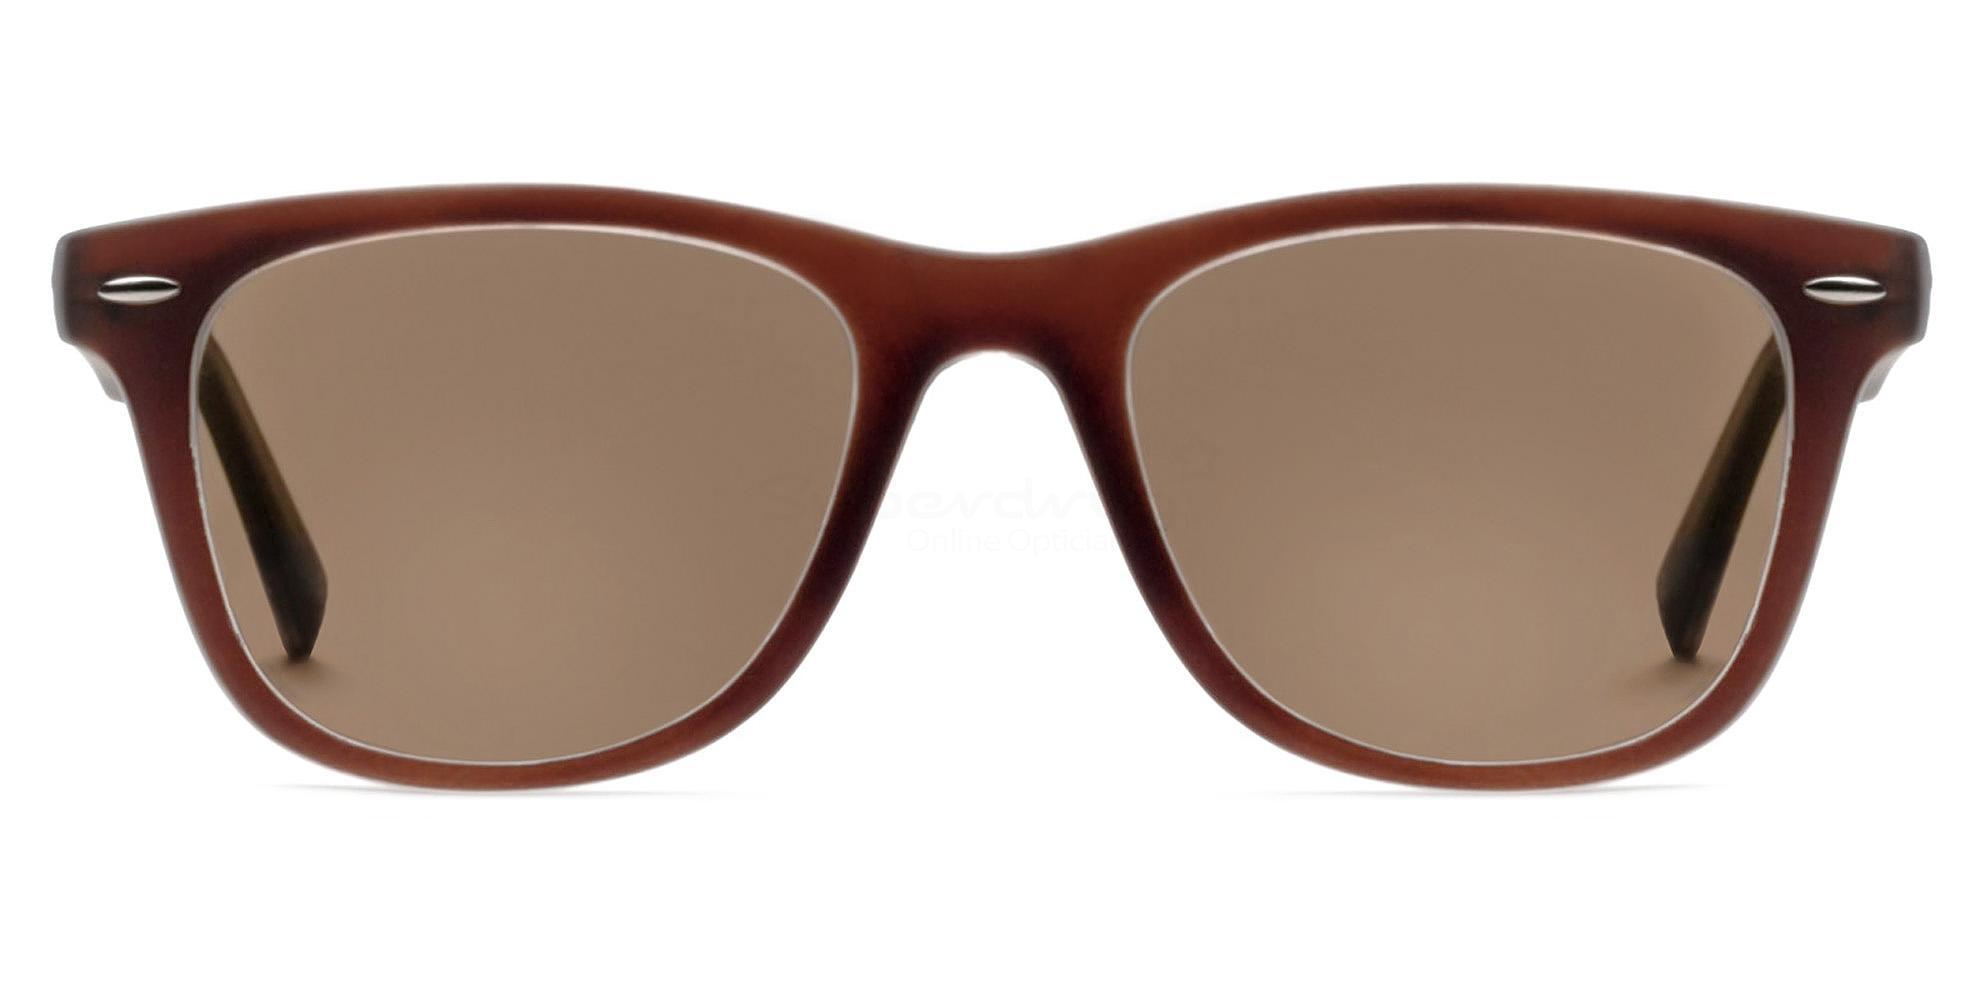 C8 8121 - Brown (Sunglasses) , Helium